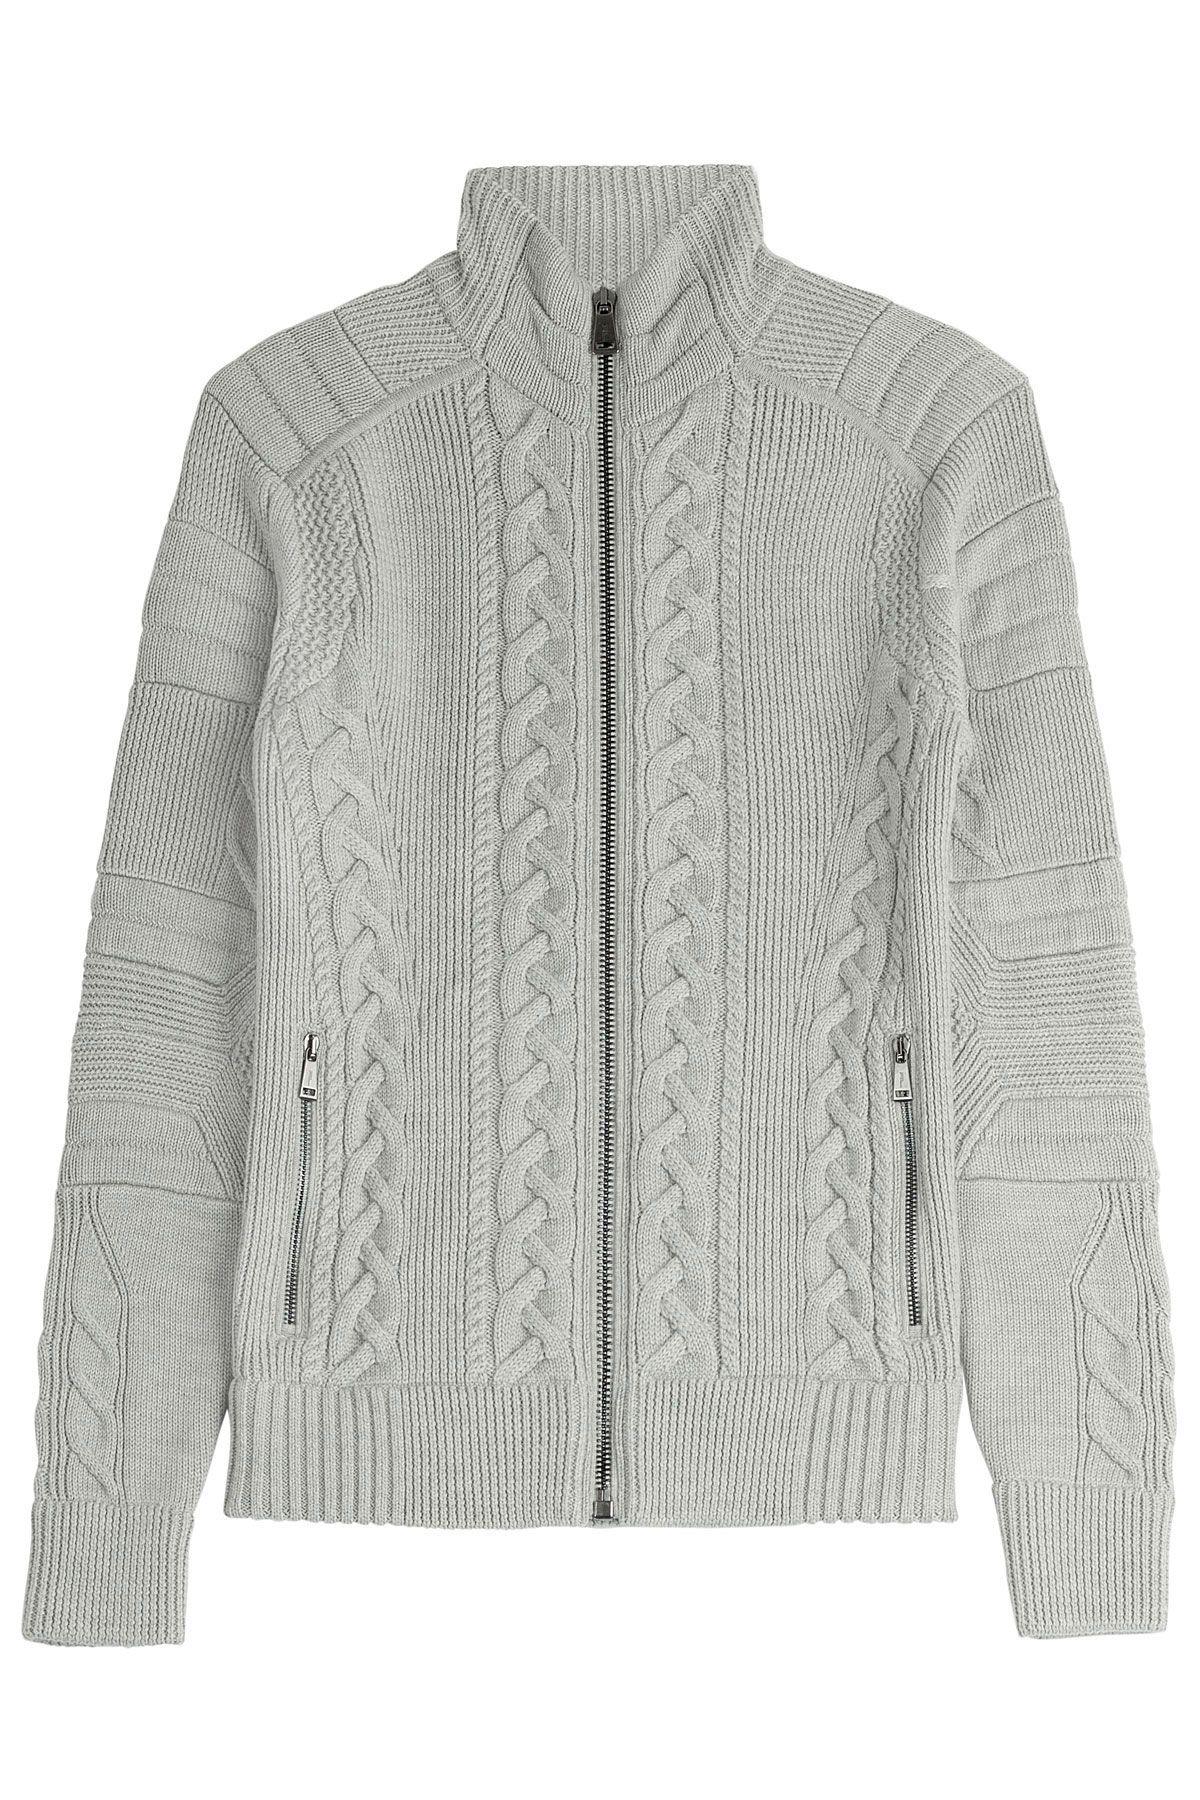 955cecf364eff3 Zipped Wool Jacket from RALPH LAUREN BLACK LABEL | Luxury fashion online |  STYLEBOP.com